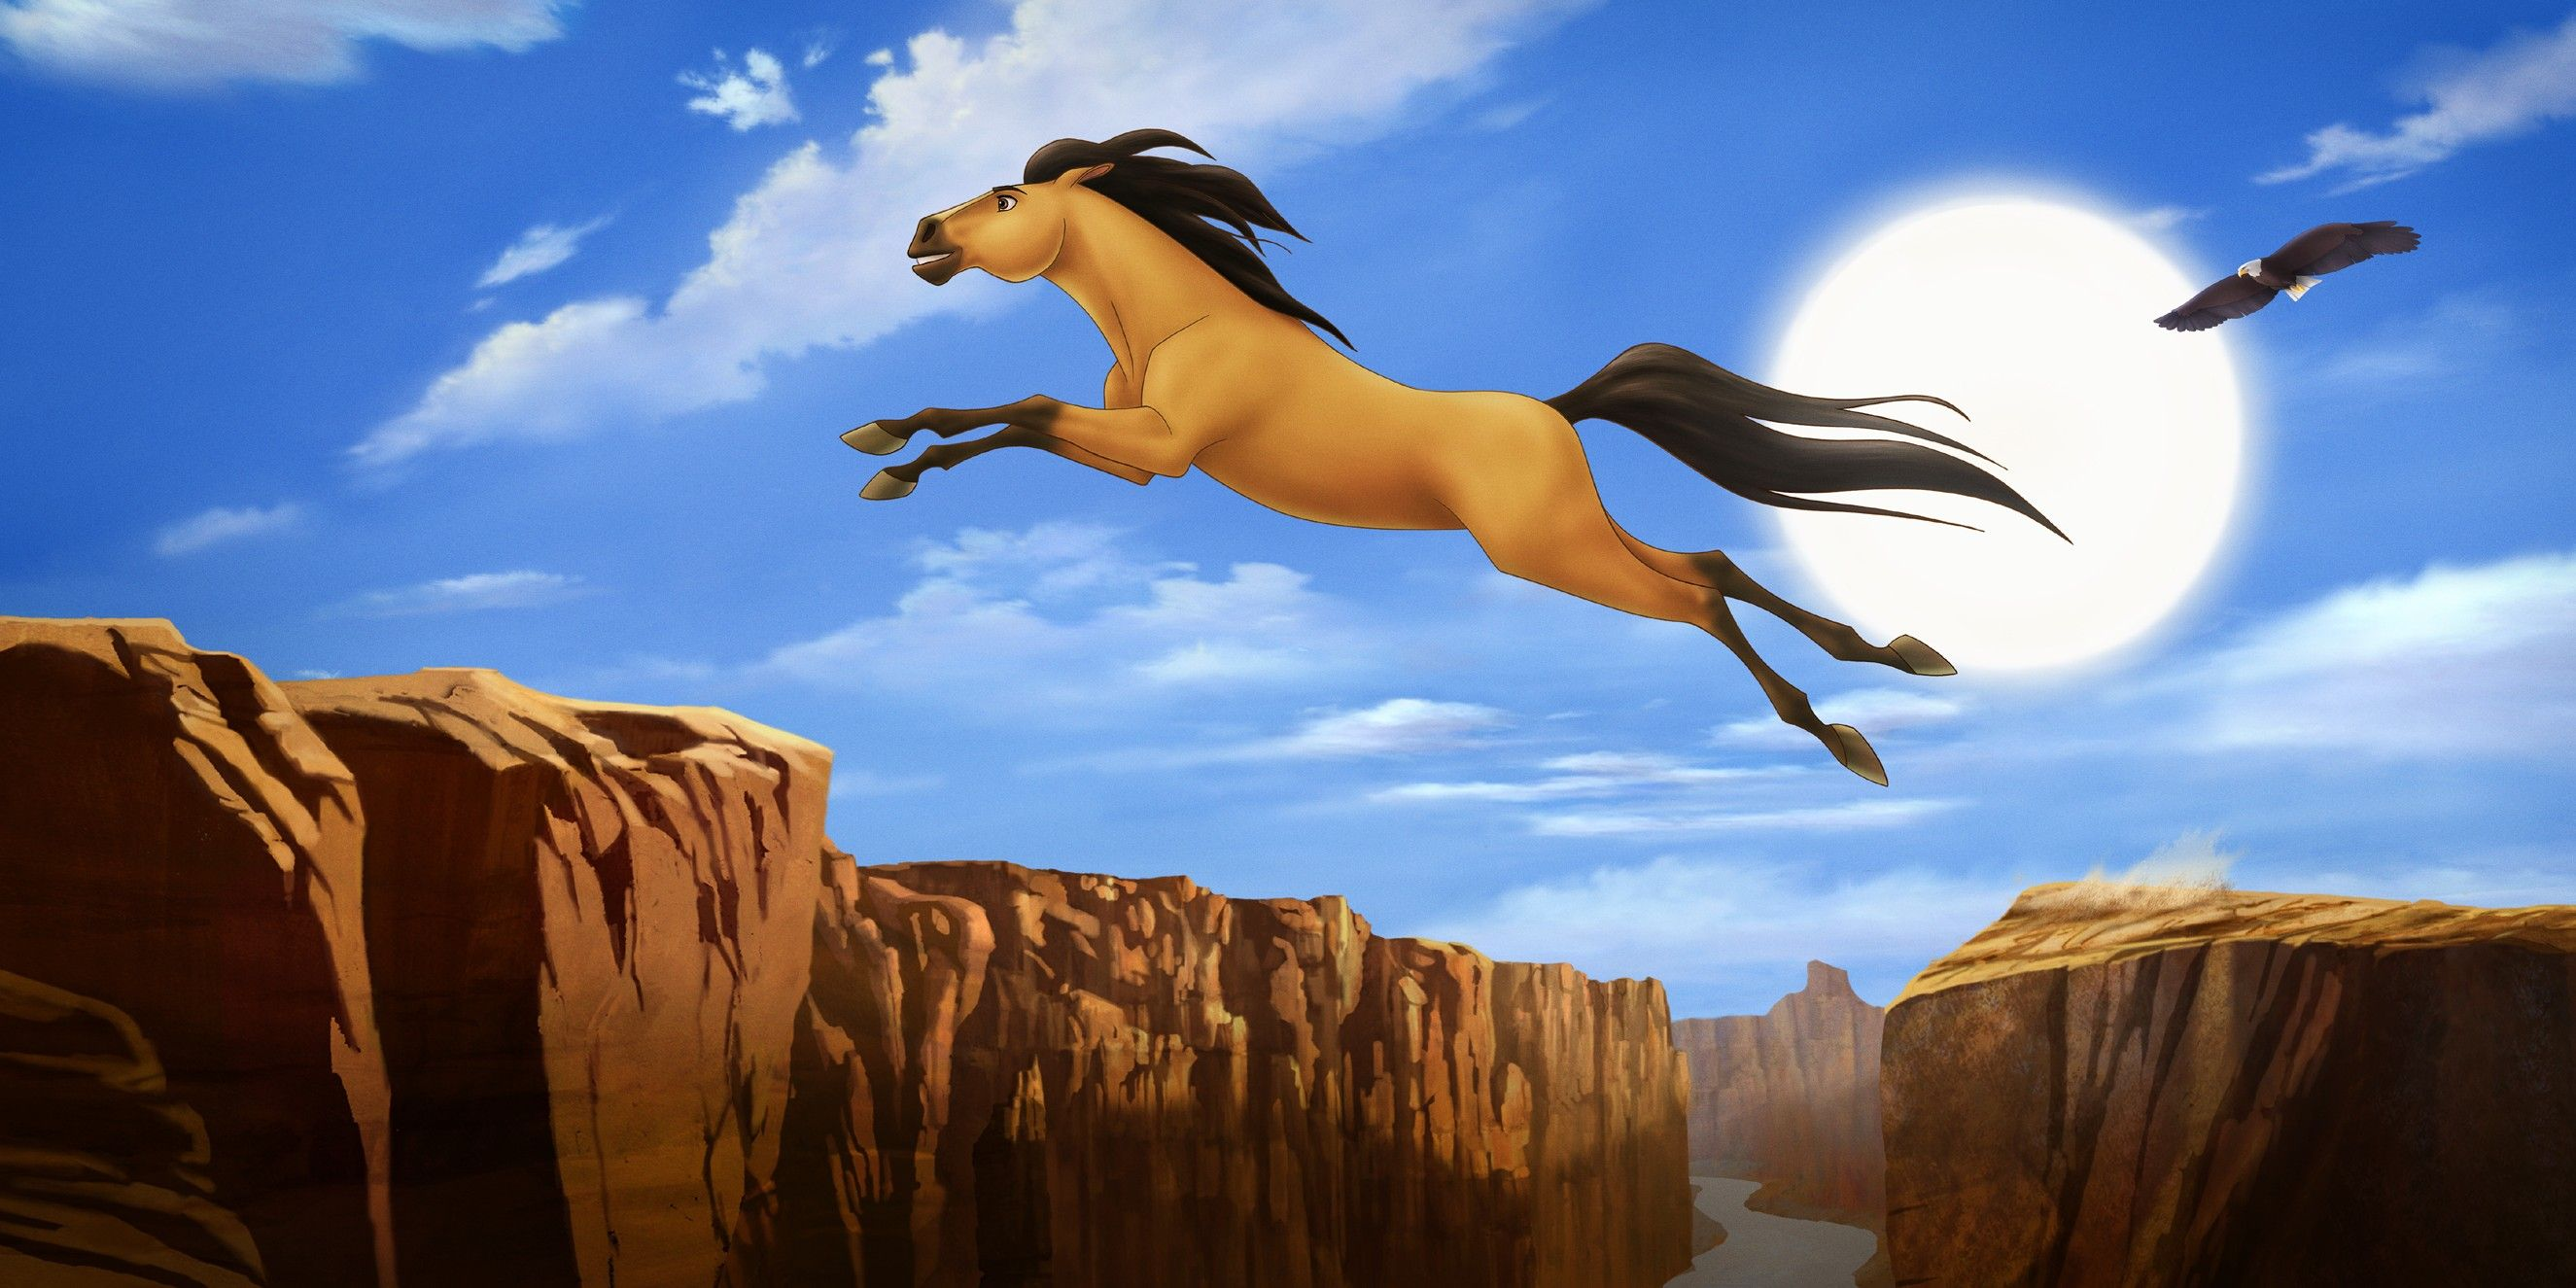 Must see Wallpaper Horse Spirit - aca87d18c129c003f165d1a63cf77388  HD_879888.jpg